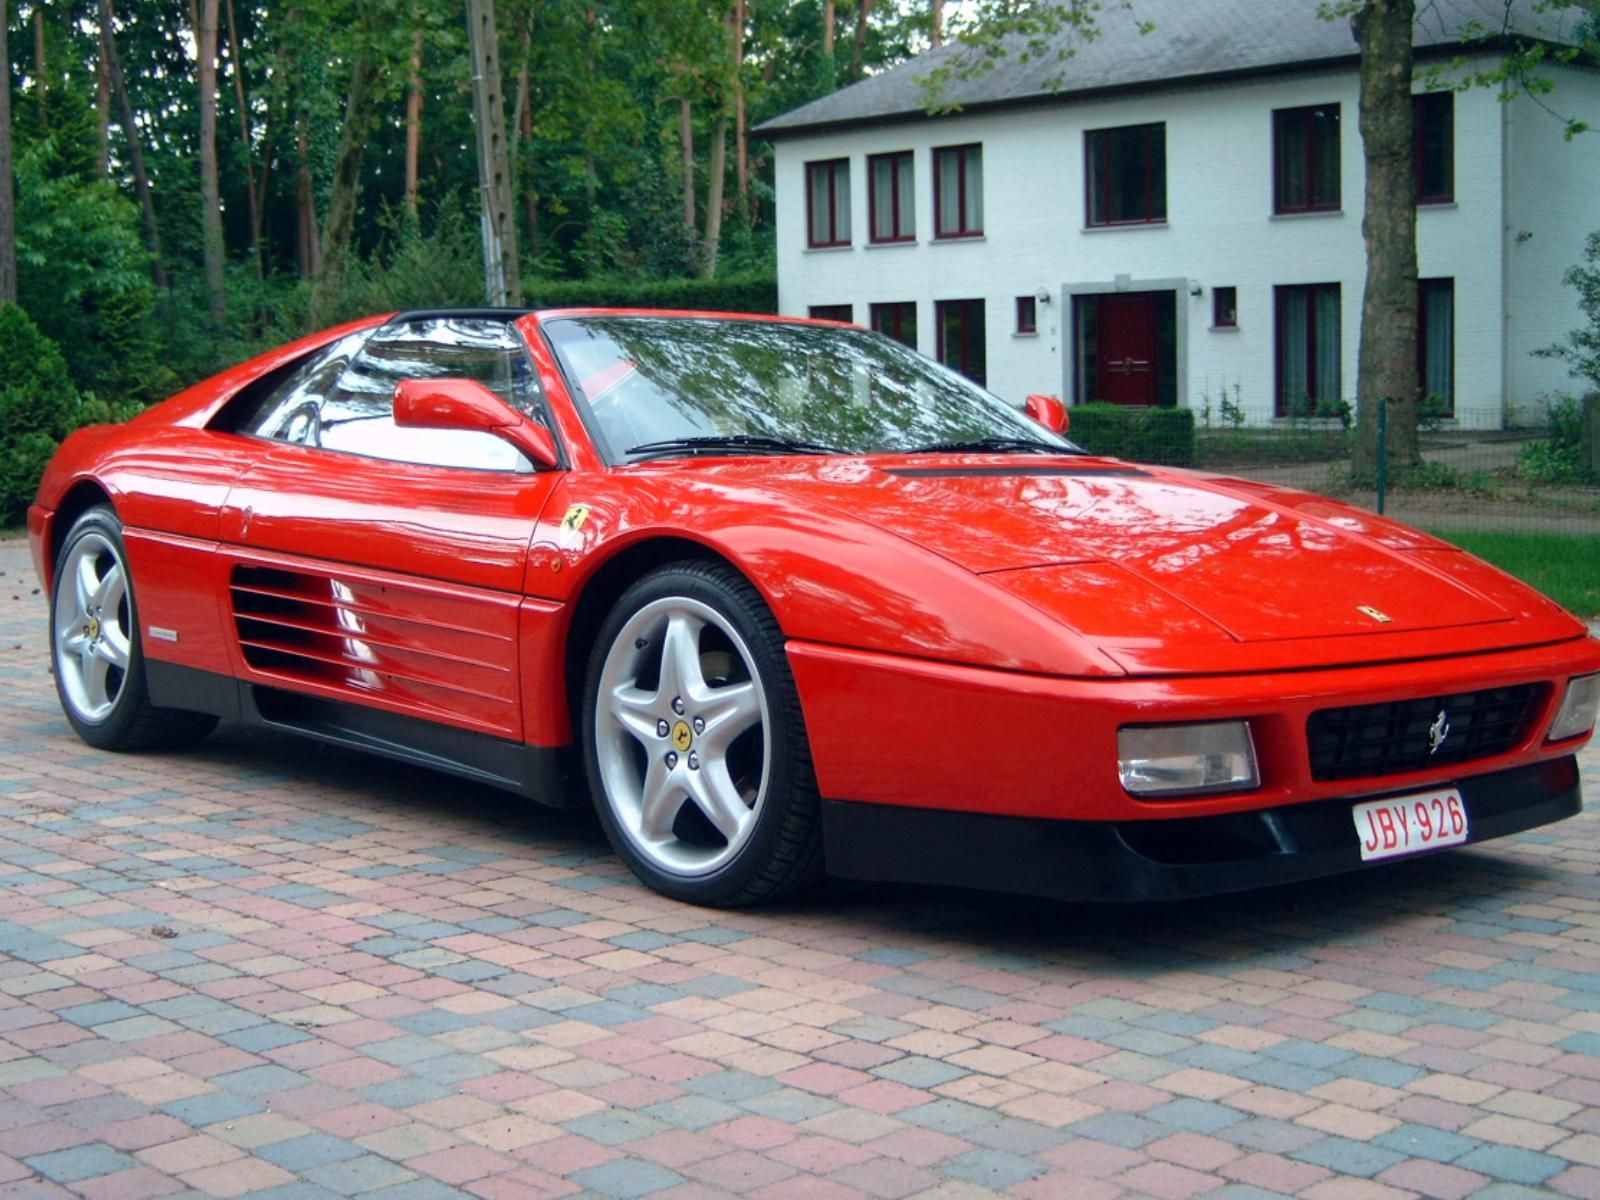 Ferrari 348 Series | Ferrari | Pinterest | Ferrari and Cars